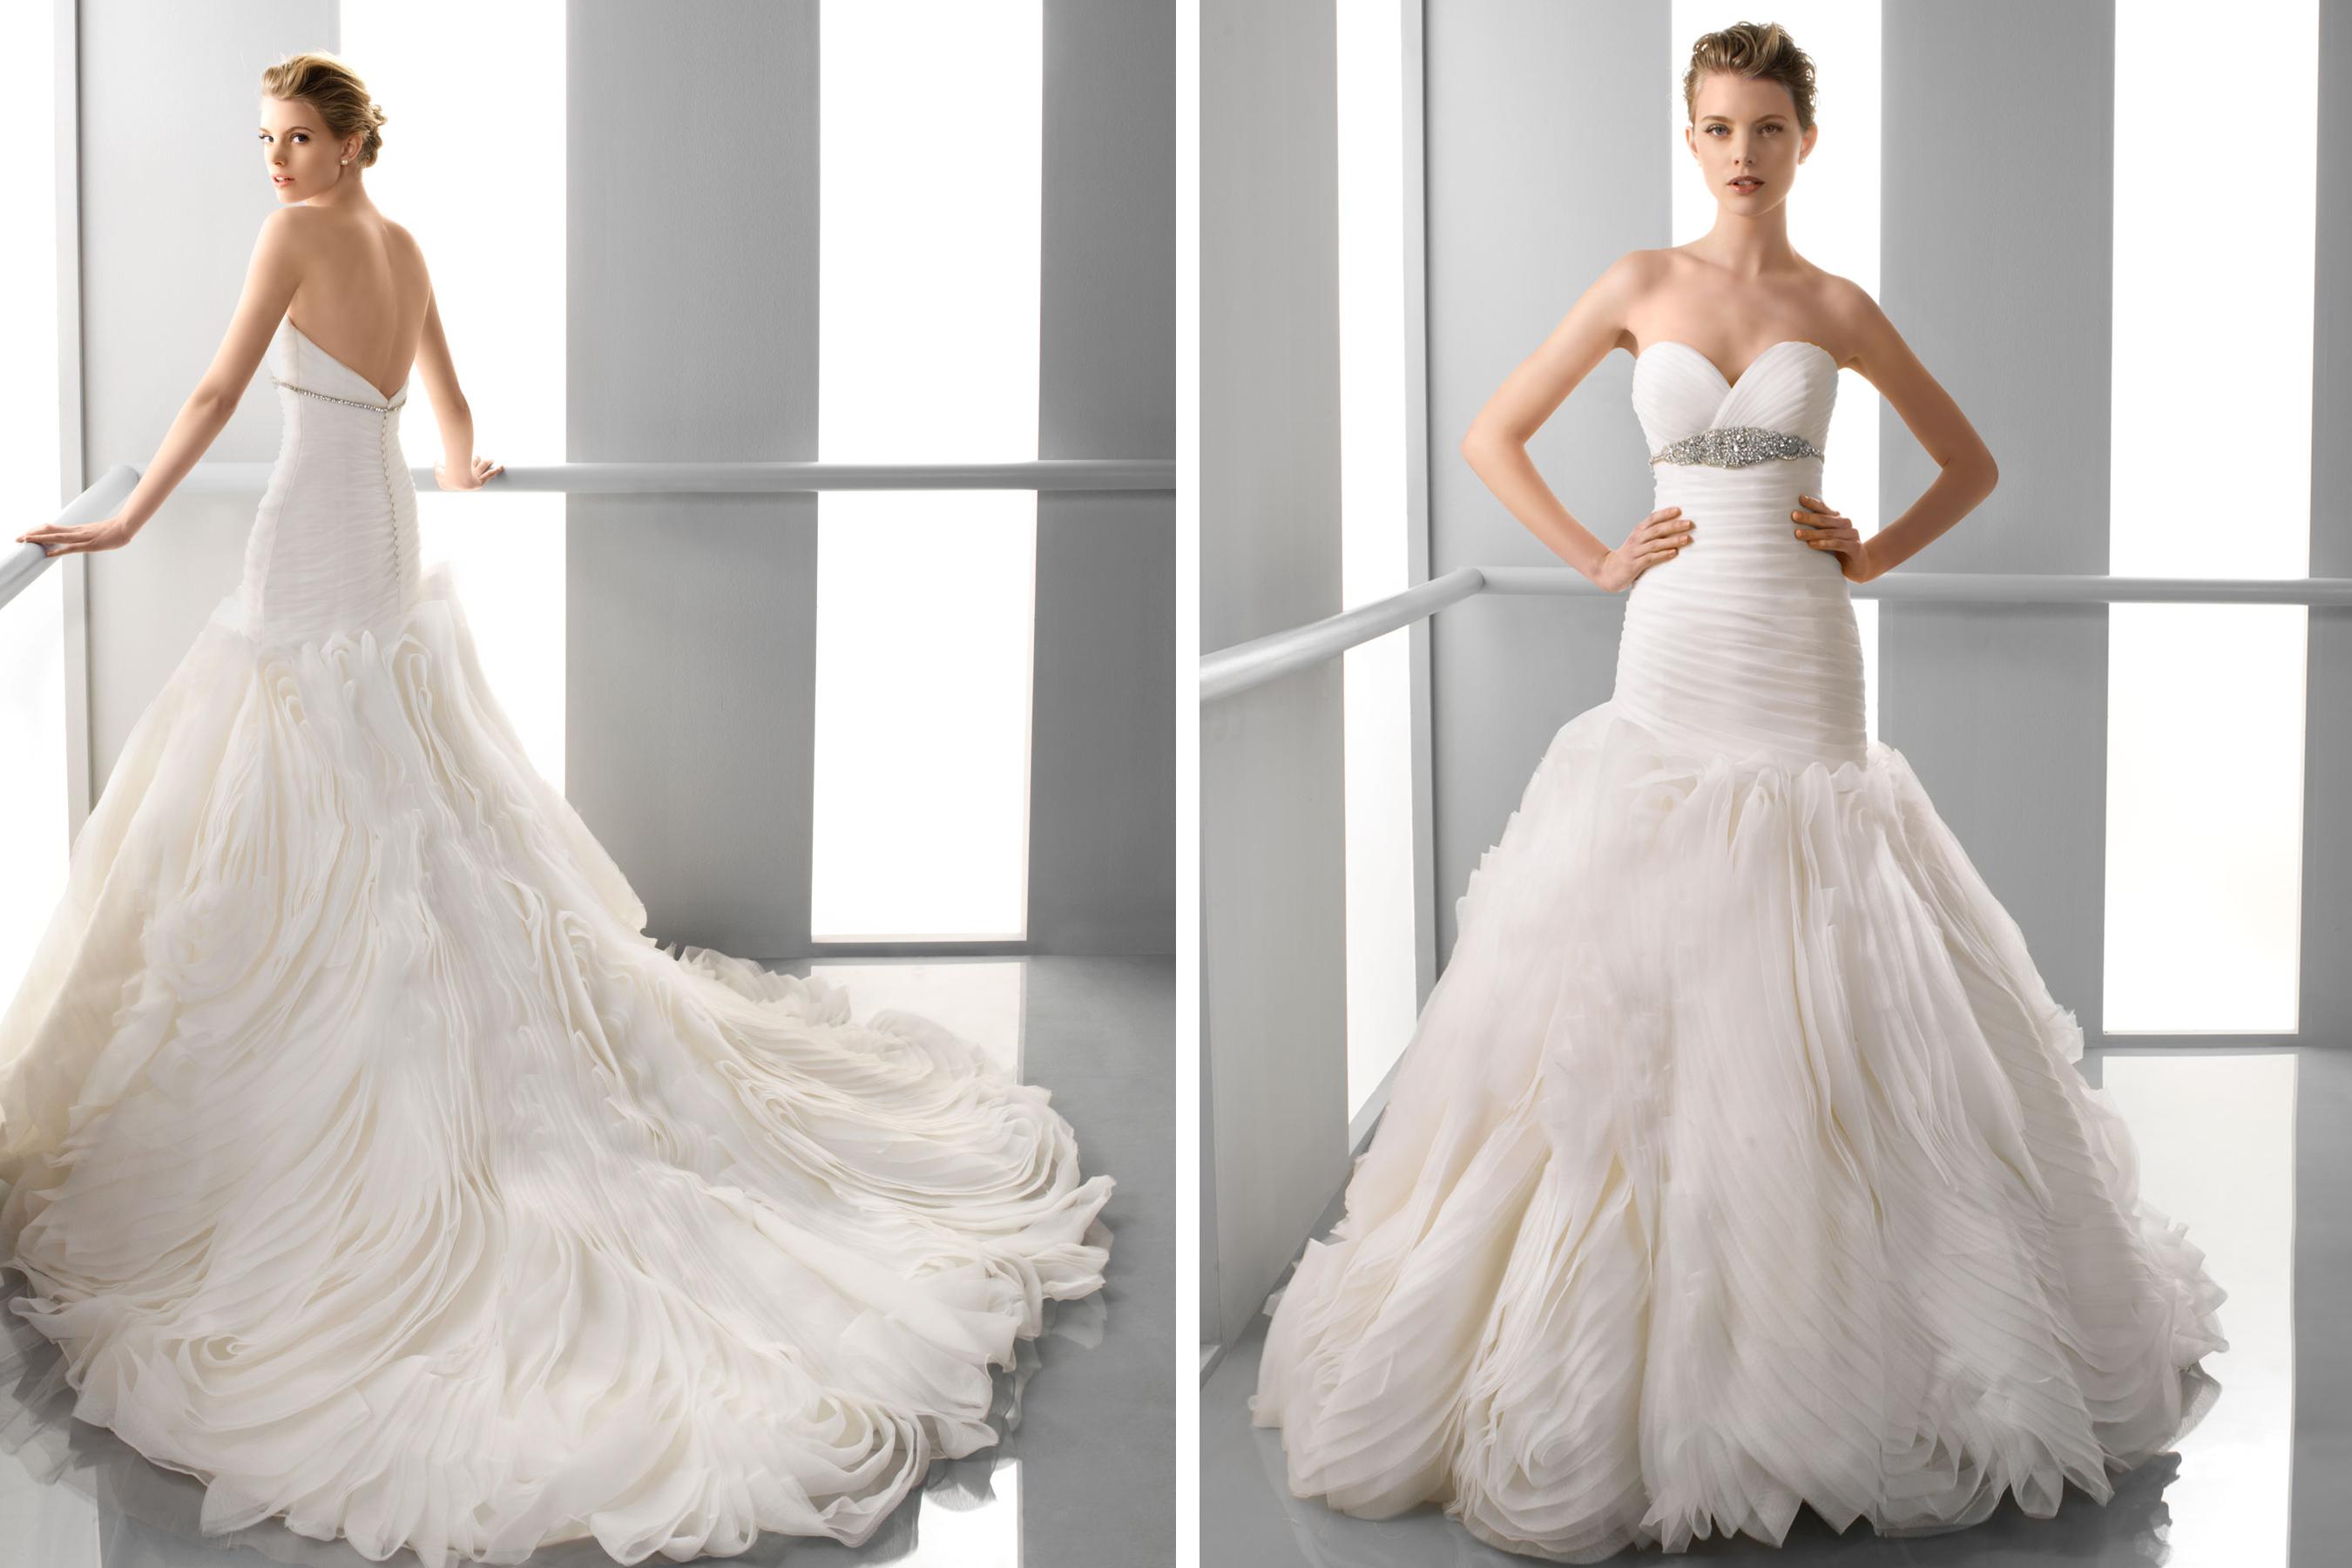 Alma novia wedding dress 2013 bridal francine for Alma novia wedding dress